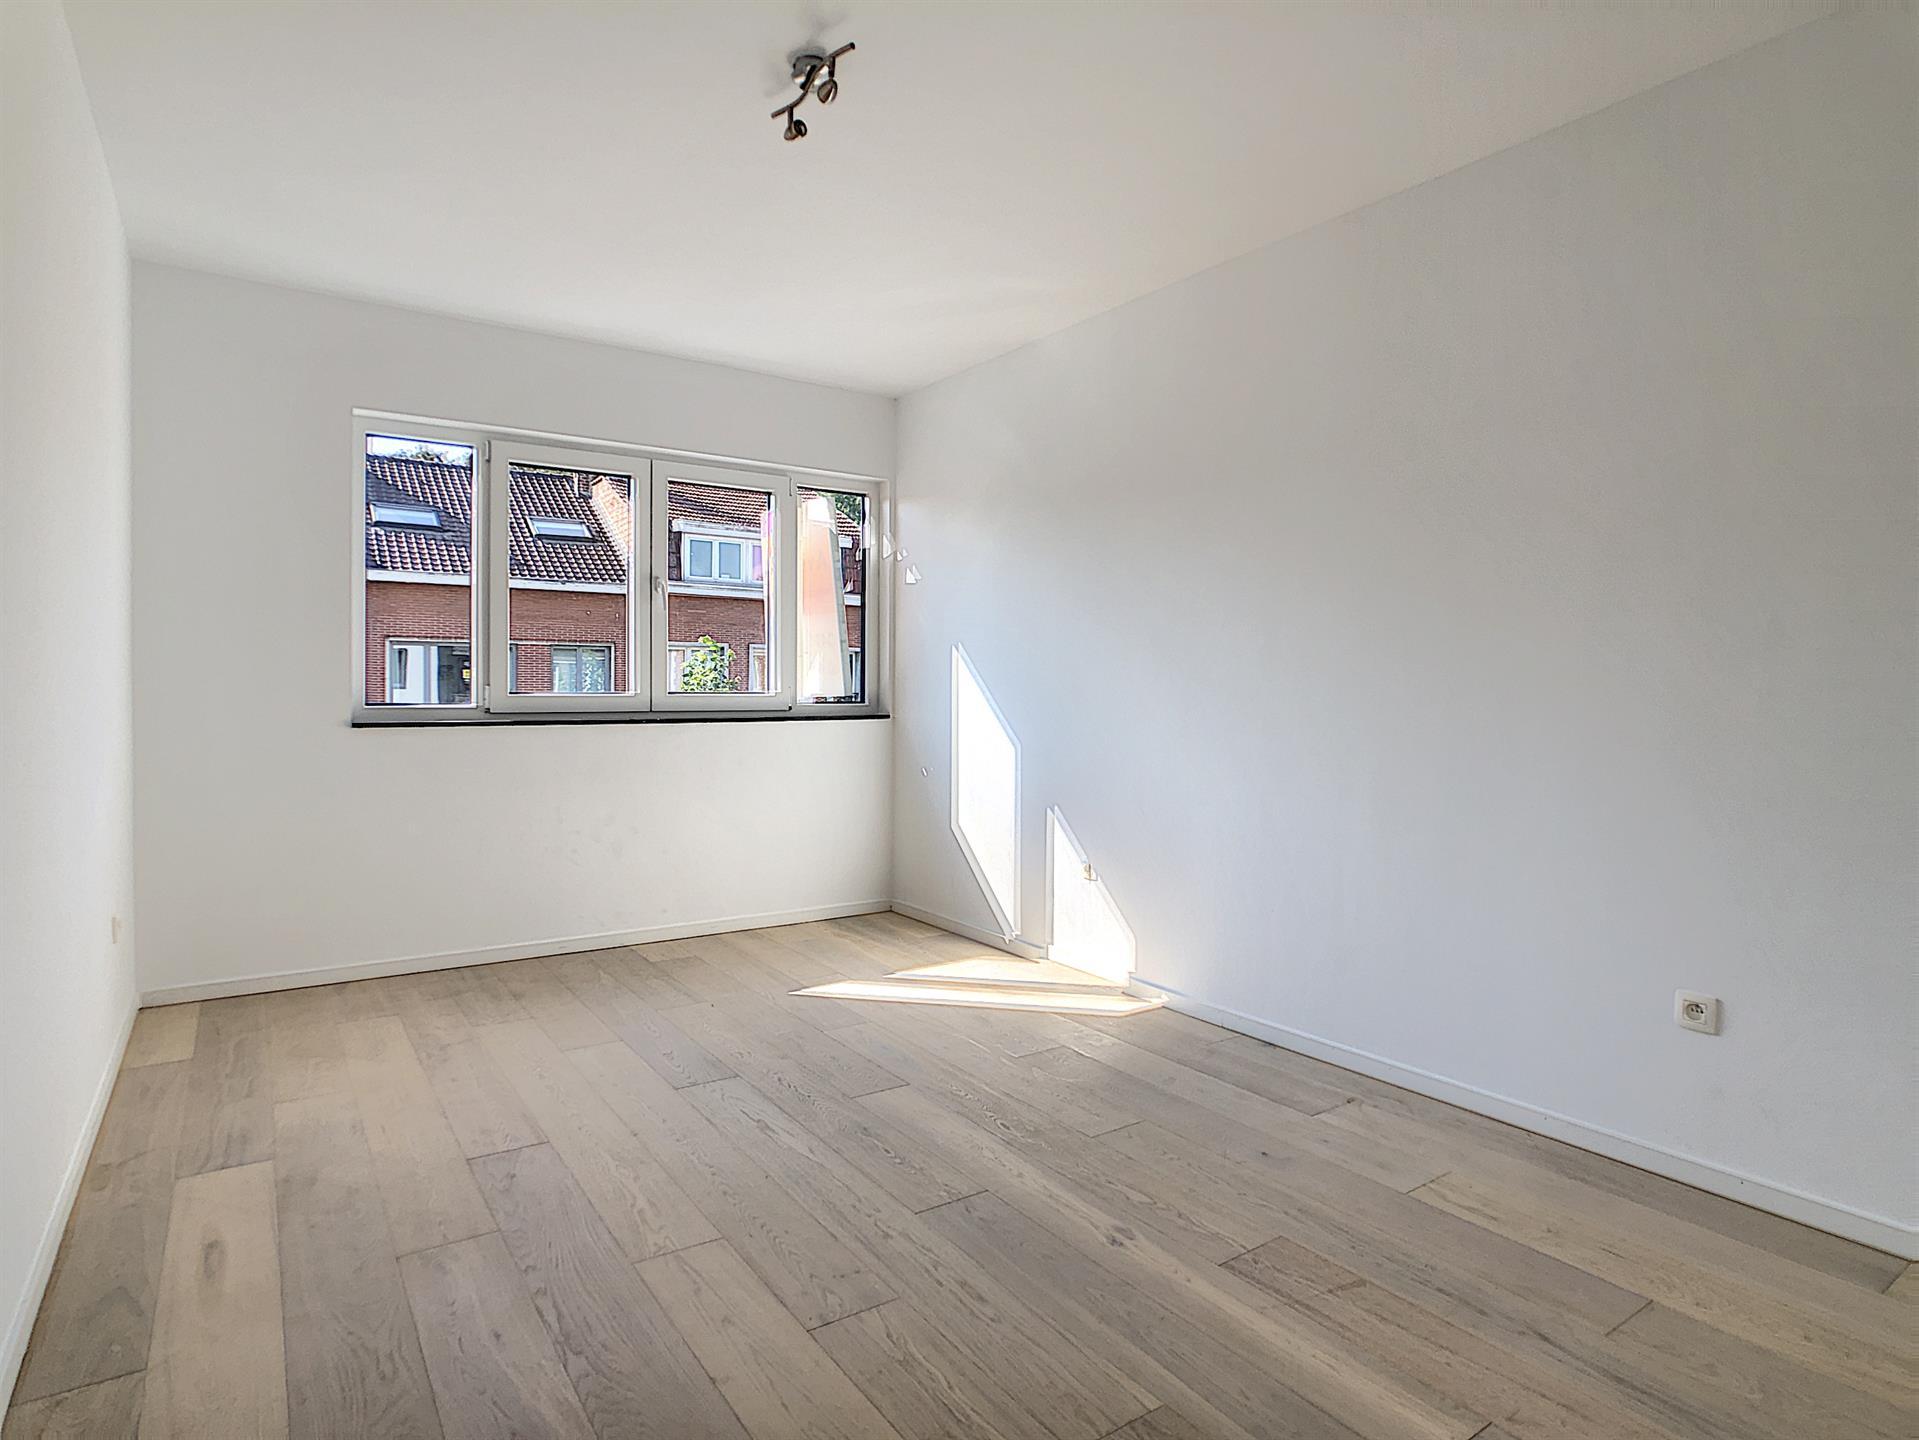 Appartement - Anderlecht - #4252376-28